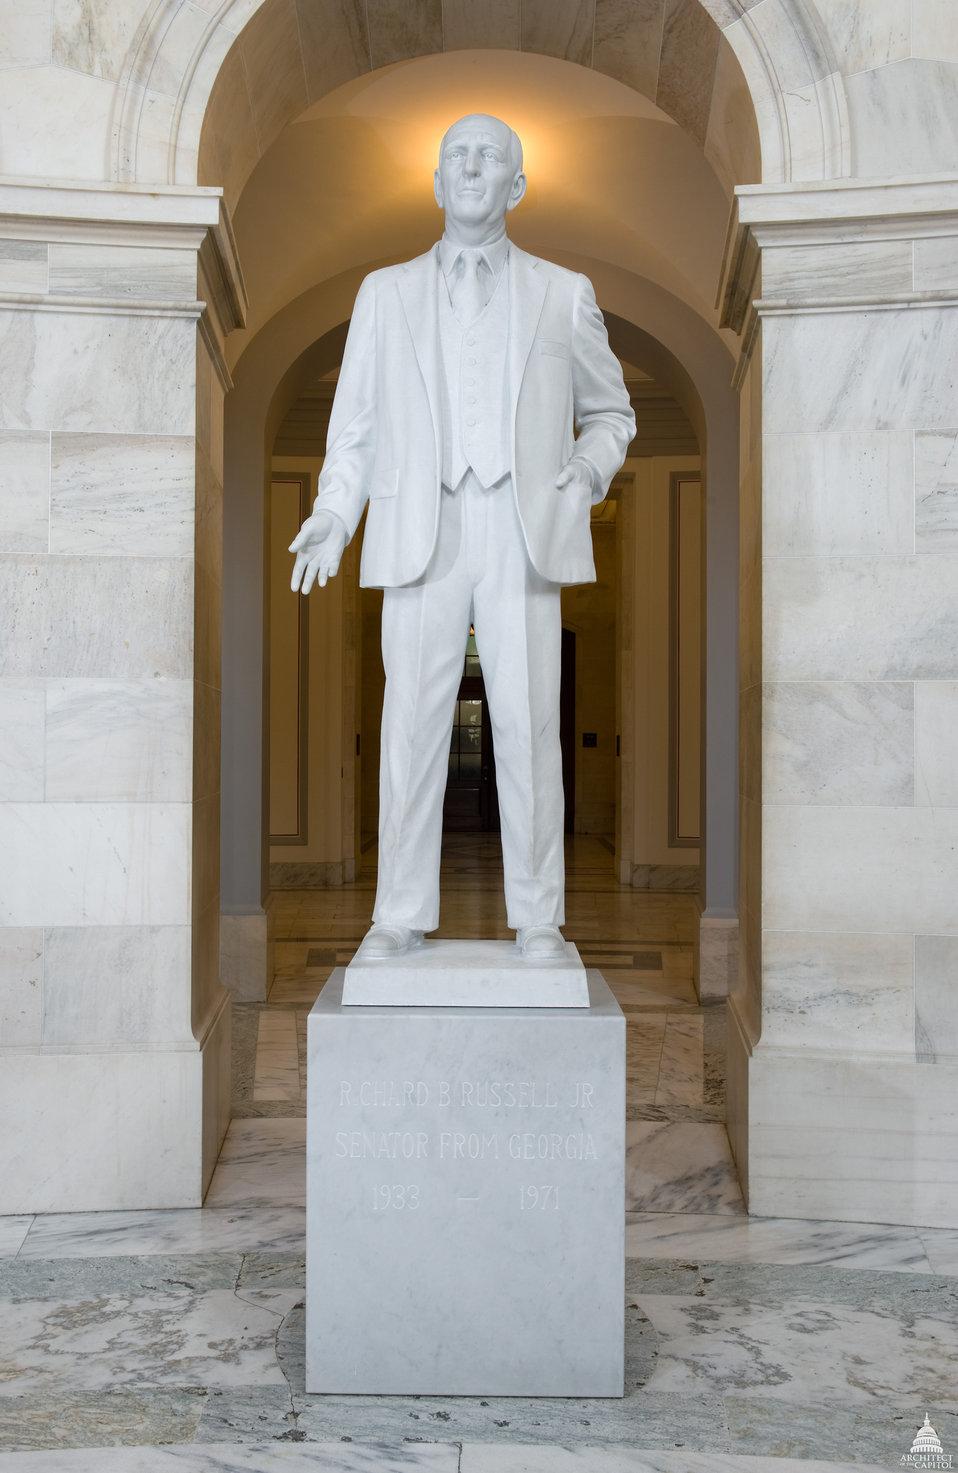 Richard B. Russell Statue